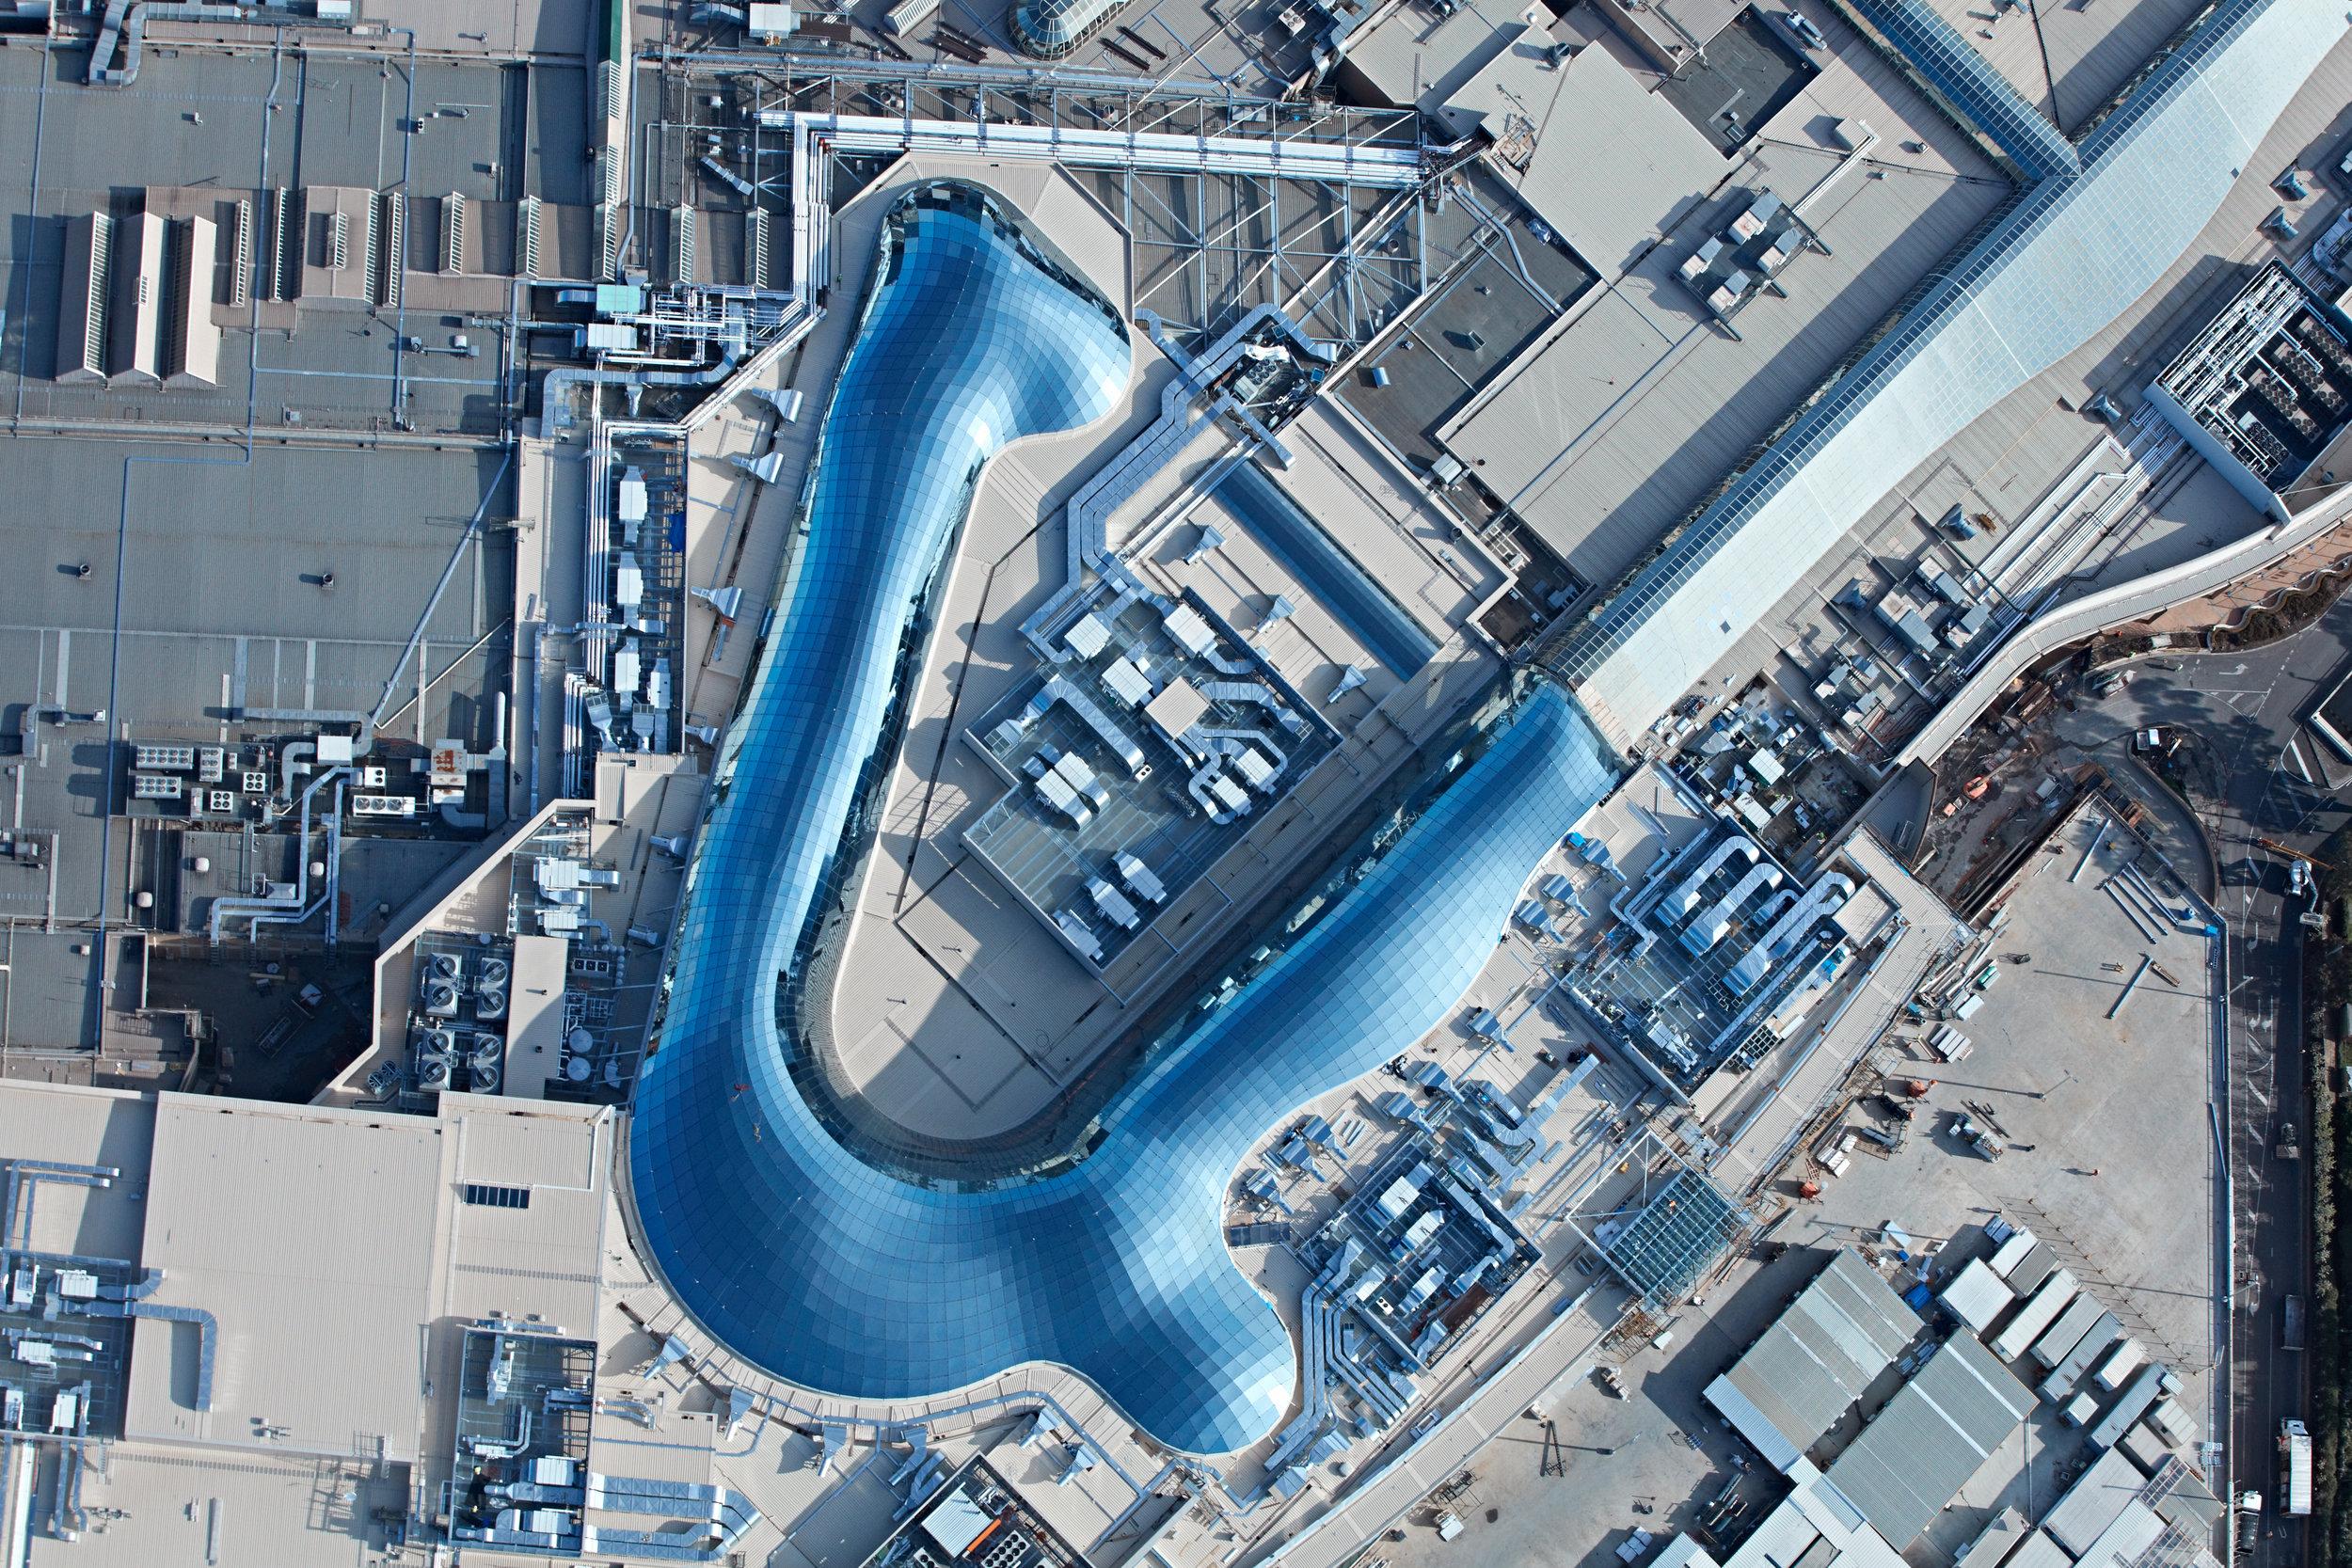 Chadstone_Aerial_Sept2016_A4_7.jpg